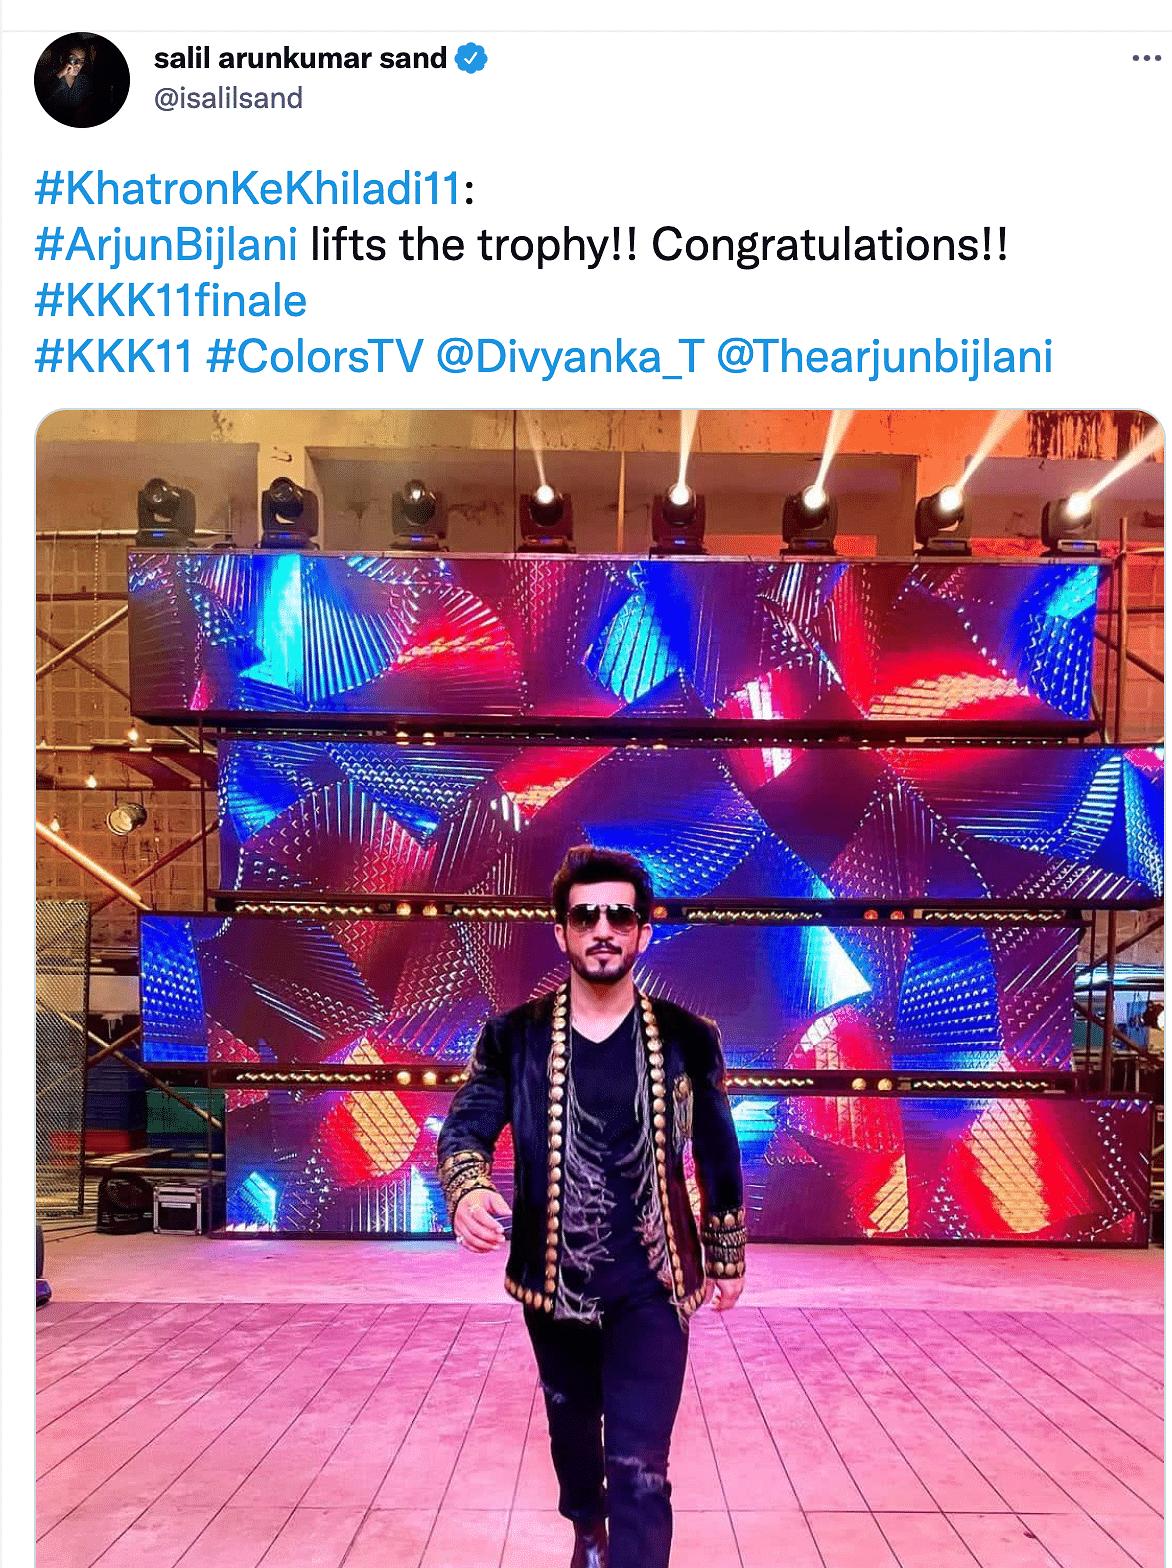 Arjun Bijlani Wins Khatron Ke Khiladi 11? Fans Celebrate Ahead of Finale